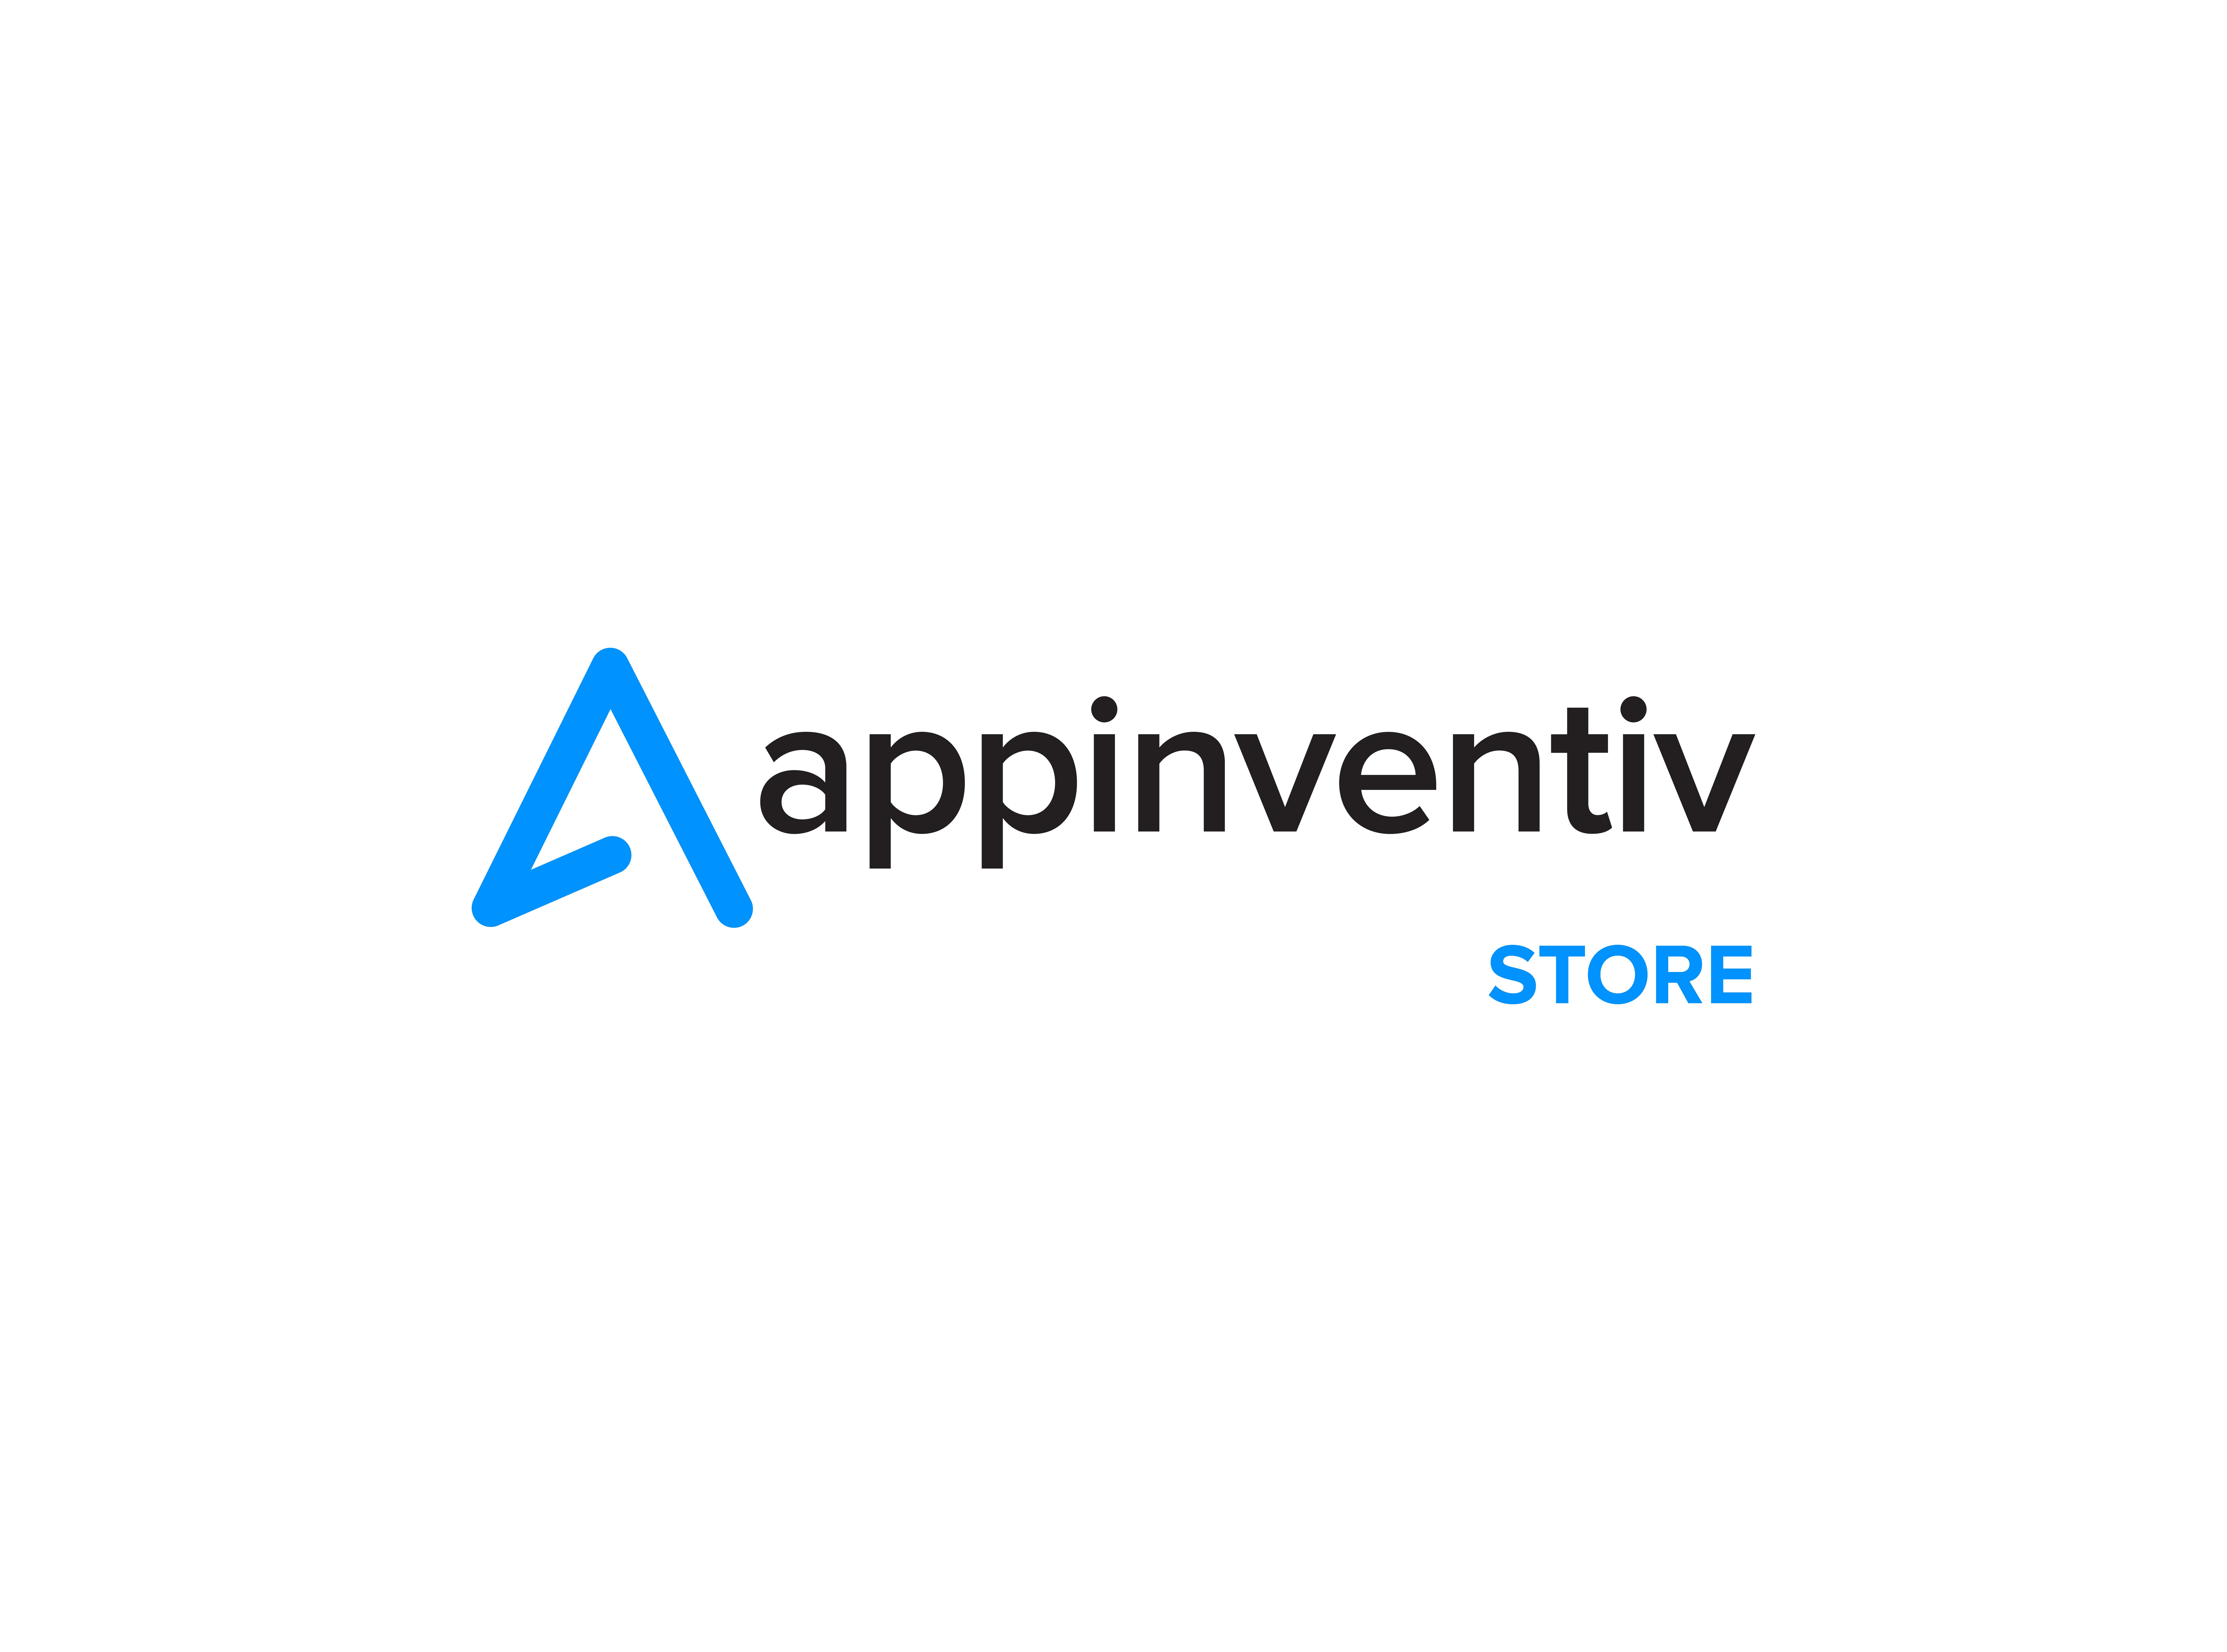 Appinventiv store application